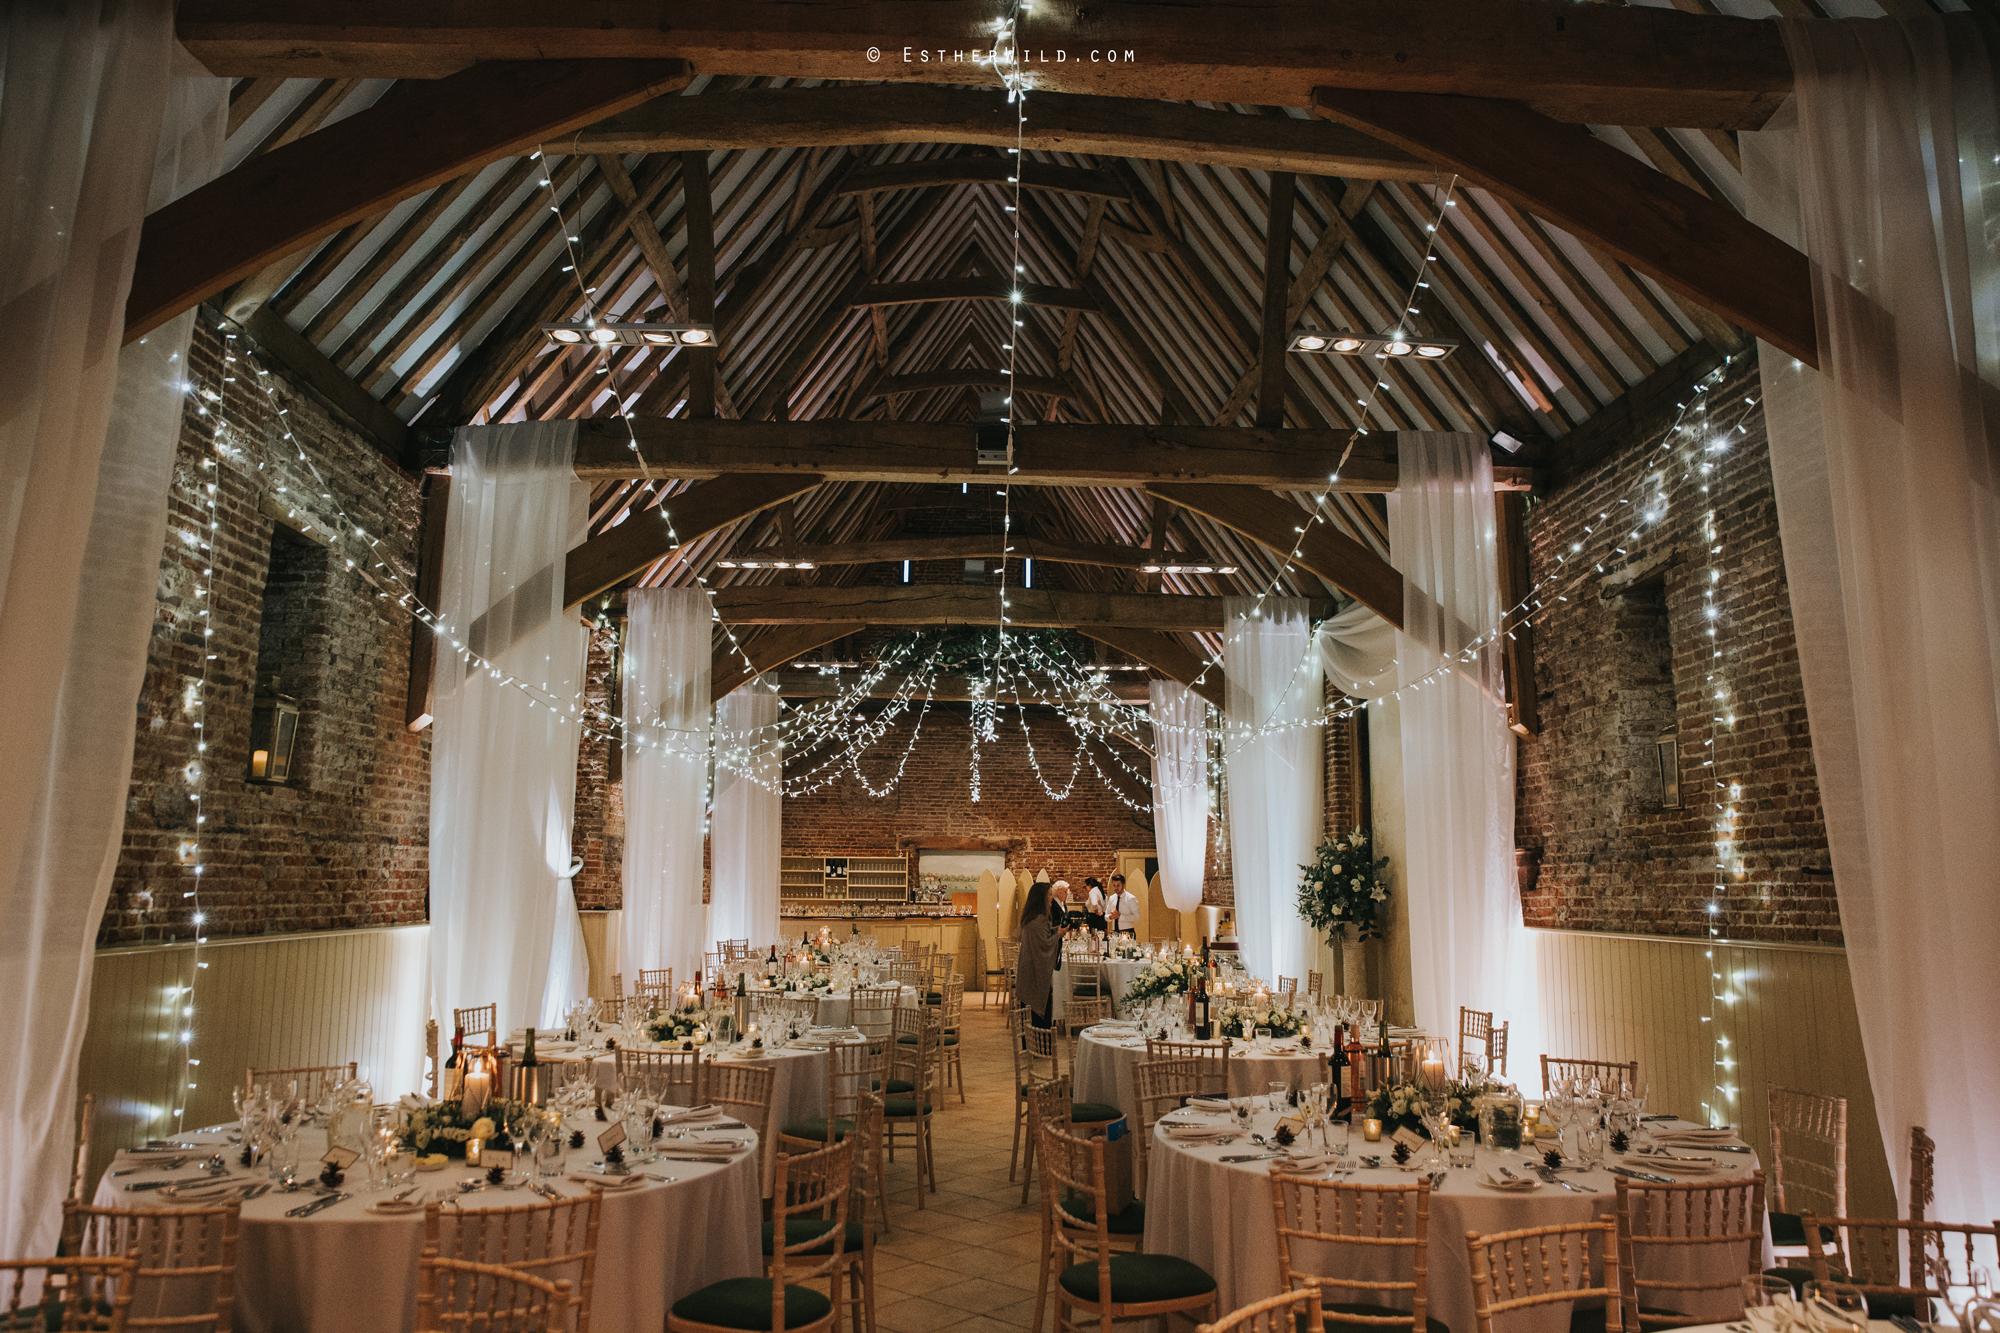 Elms_Barn_Weddings_Suffolk_Photographer_Copyright_Esther_Wild_IMG_2279.jpg